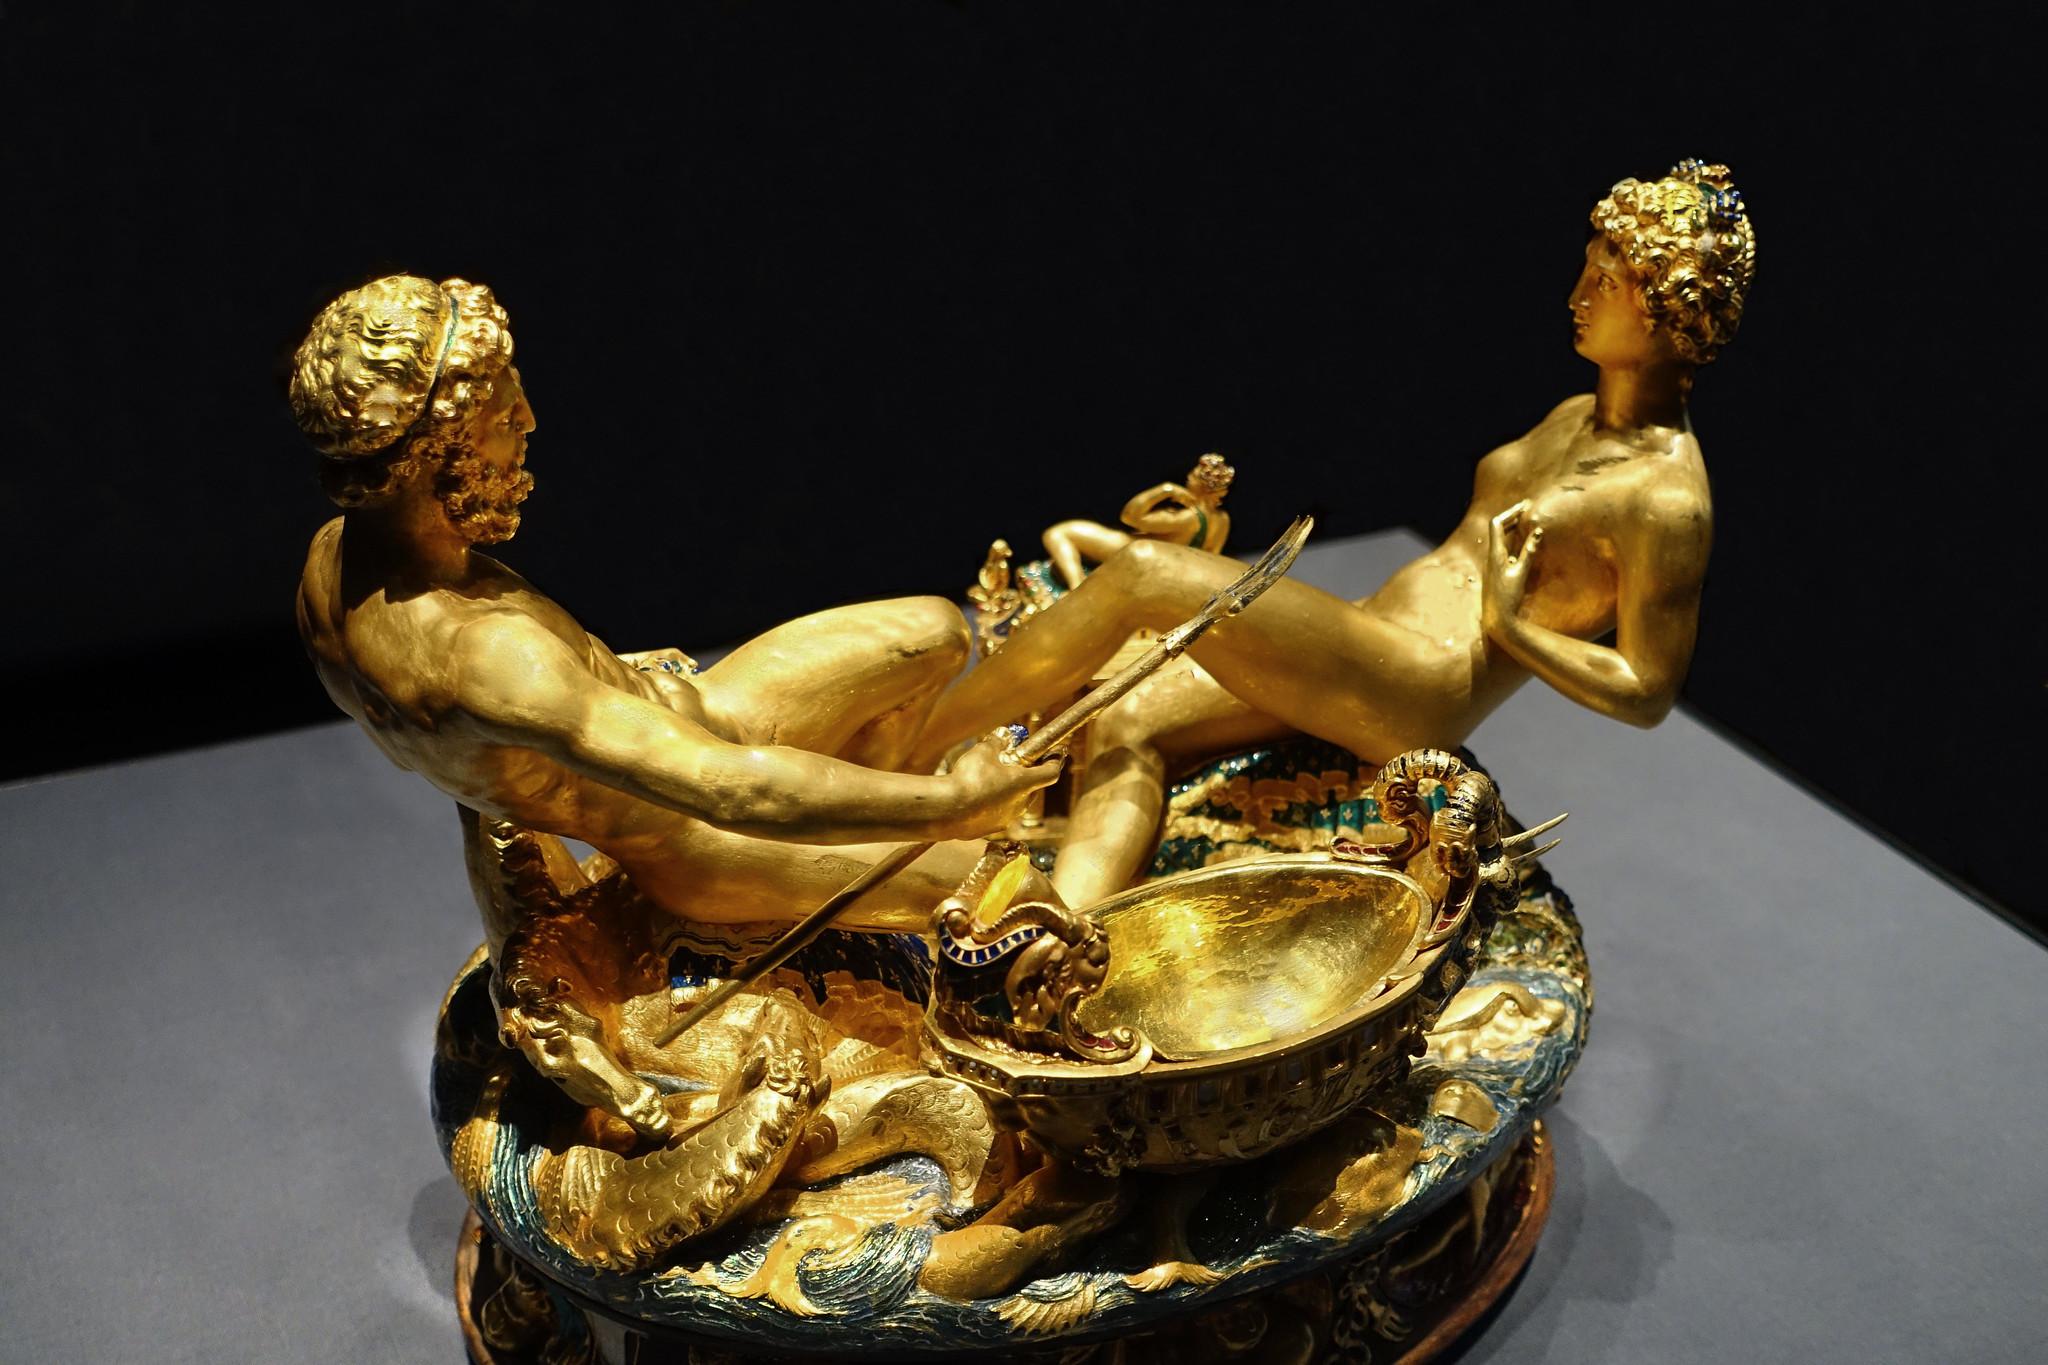 Benvenuto Cellini, Salt cellar, 1540-43, gold, enamel, ebony, and ivory, 28.5 x 21.5 x 26.3 cm (Kunsthistorisches Museum, Vienna)